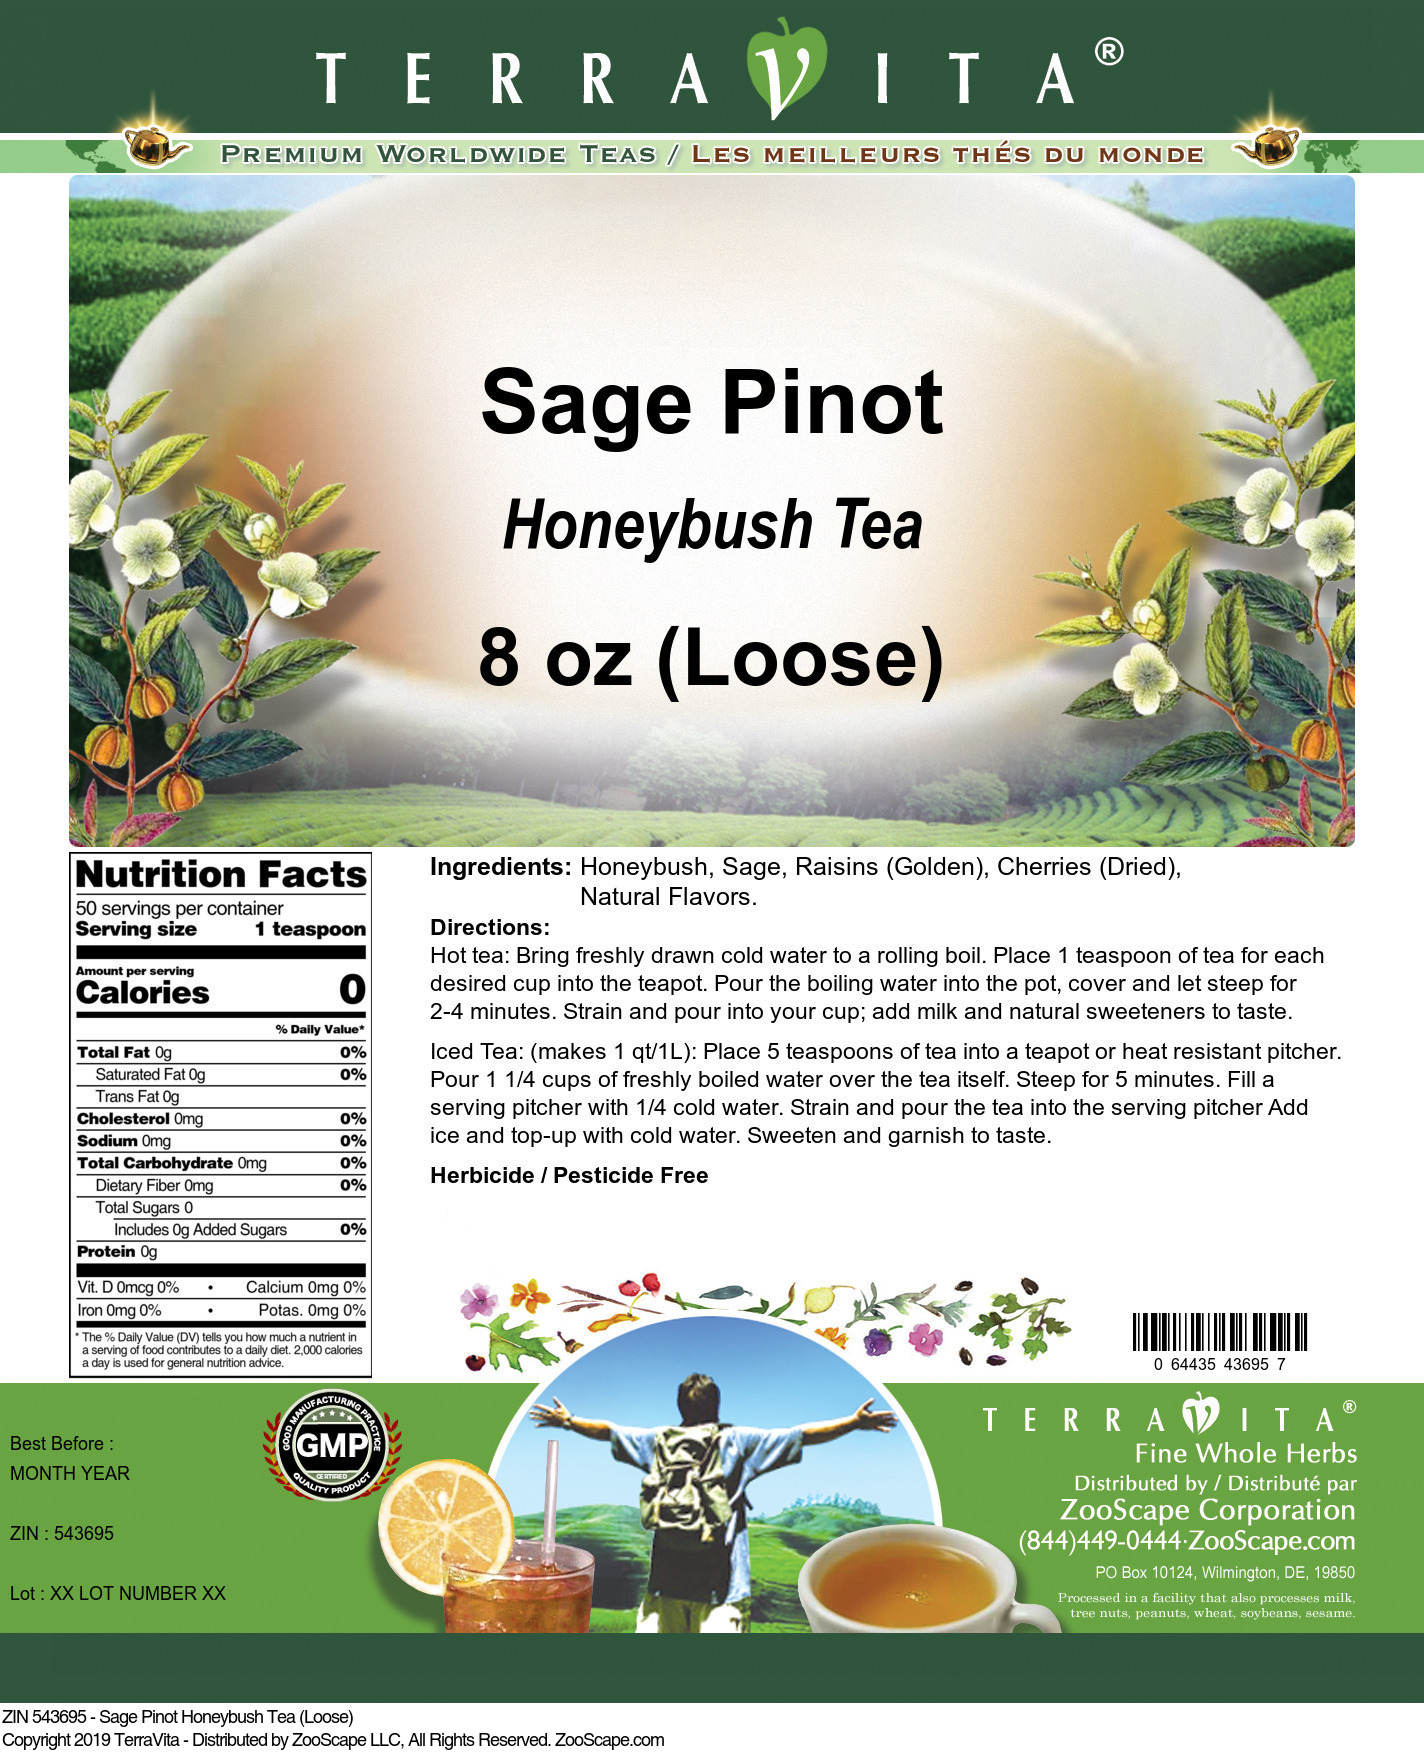 Sage Pinot Honeybush Tea